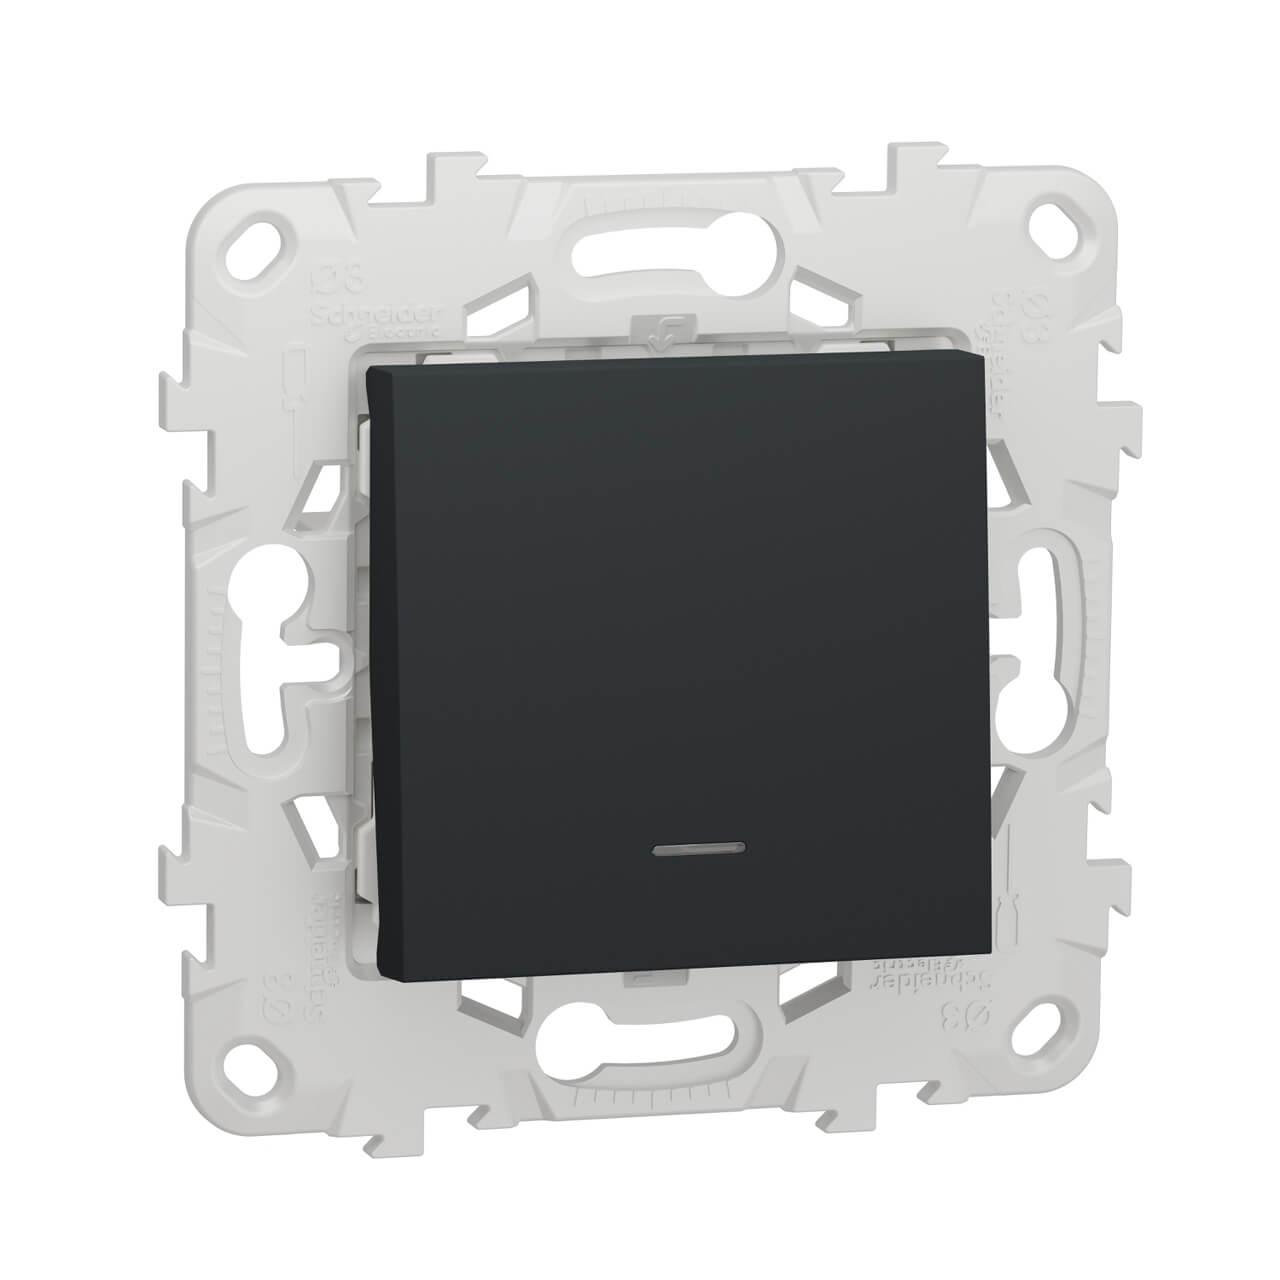 Выключатель Schneider Electric NU520154N Unica New